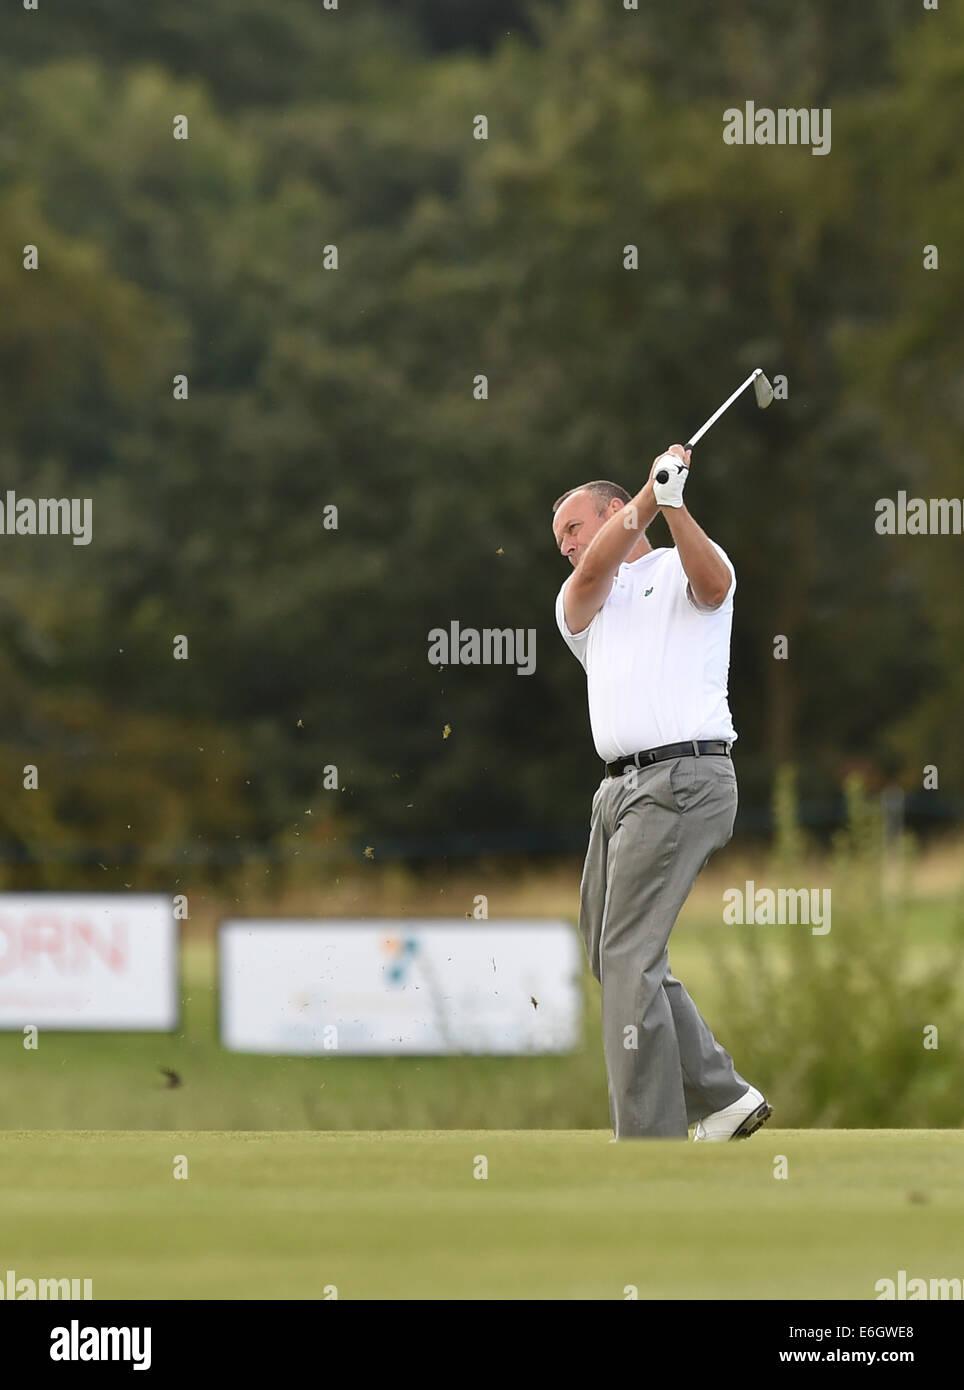 Darlington, UK. 23rd Aug, 2014. English Senior Open Golf. Rockcliffe Hall. Jamie Spence hitting off the fairway - Stock Image